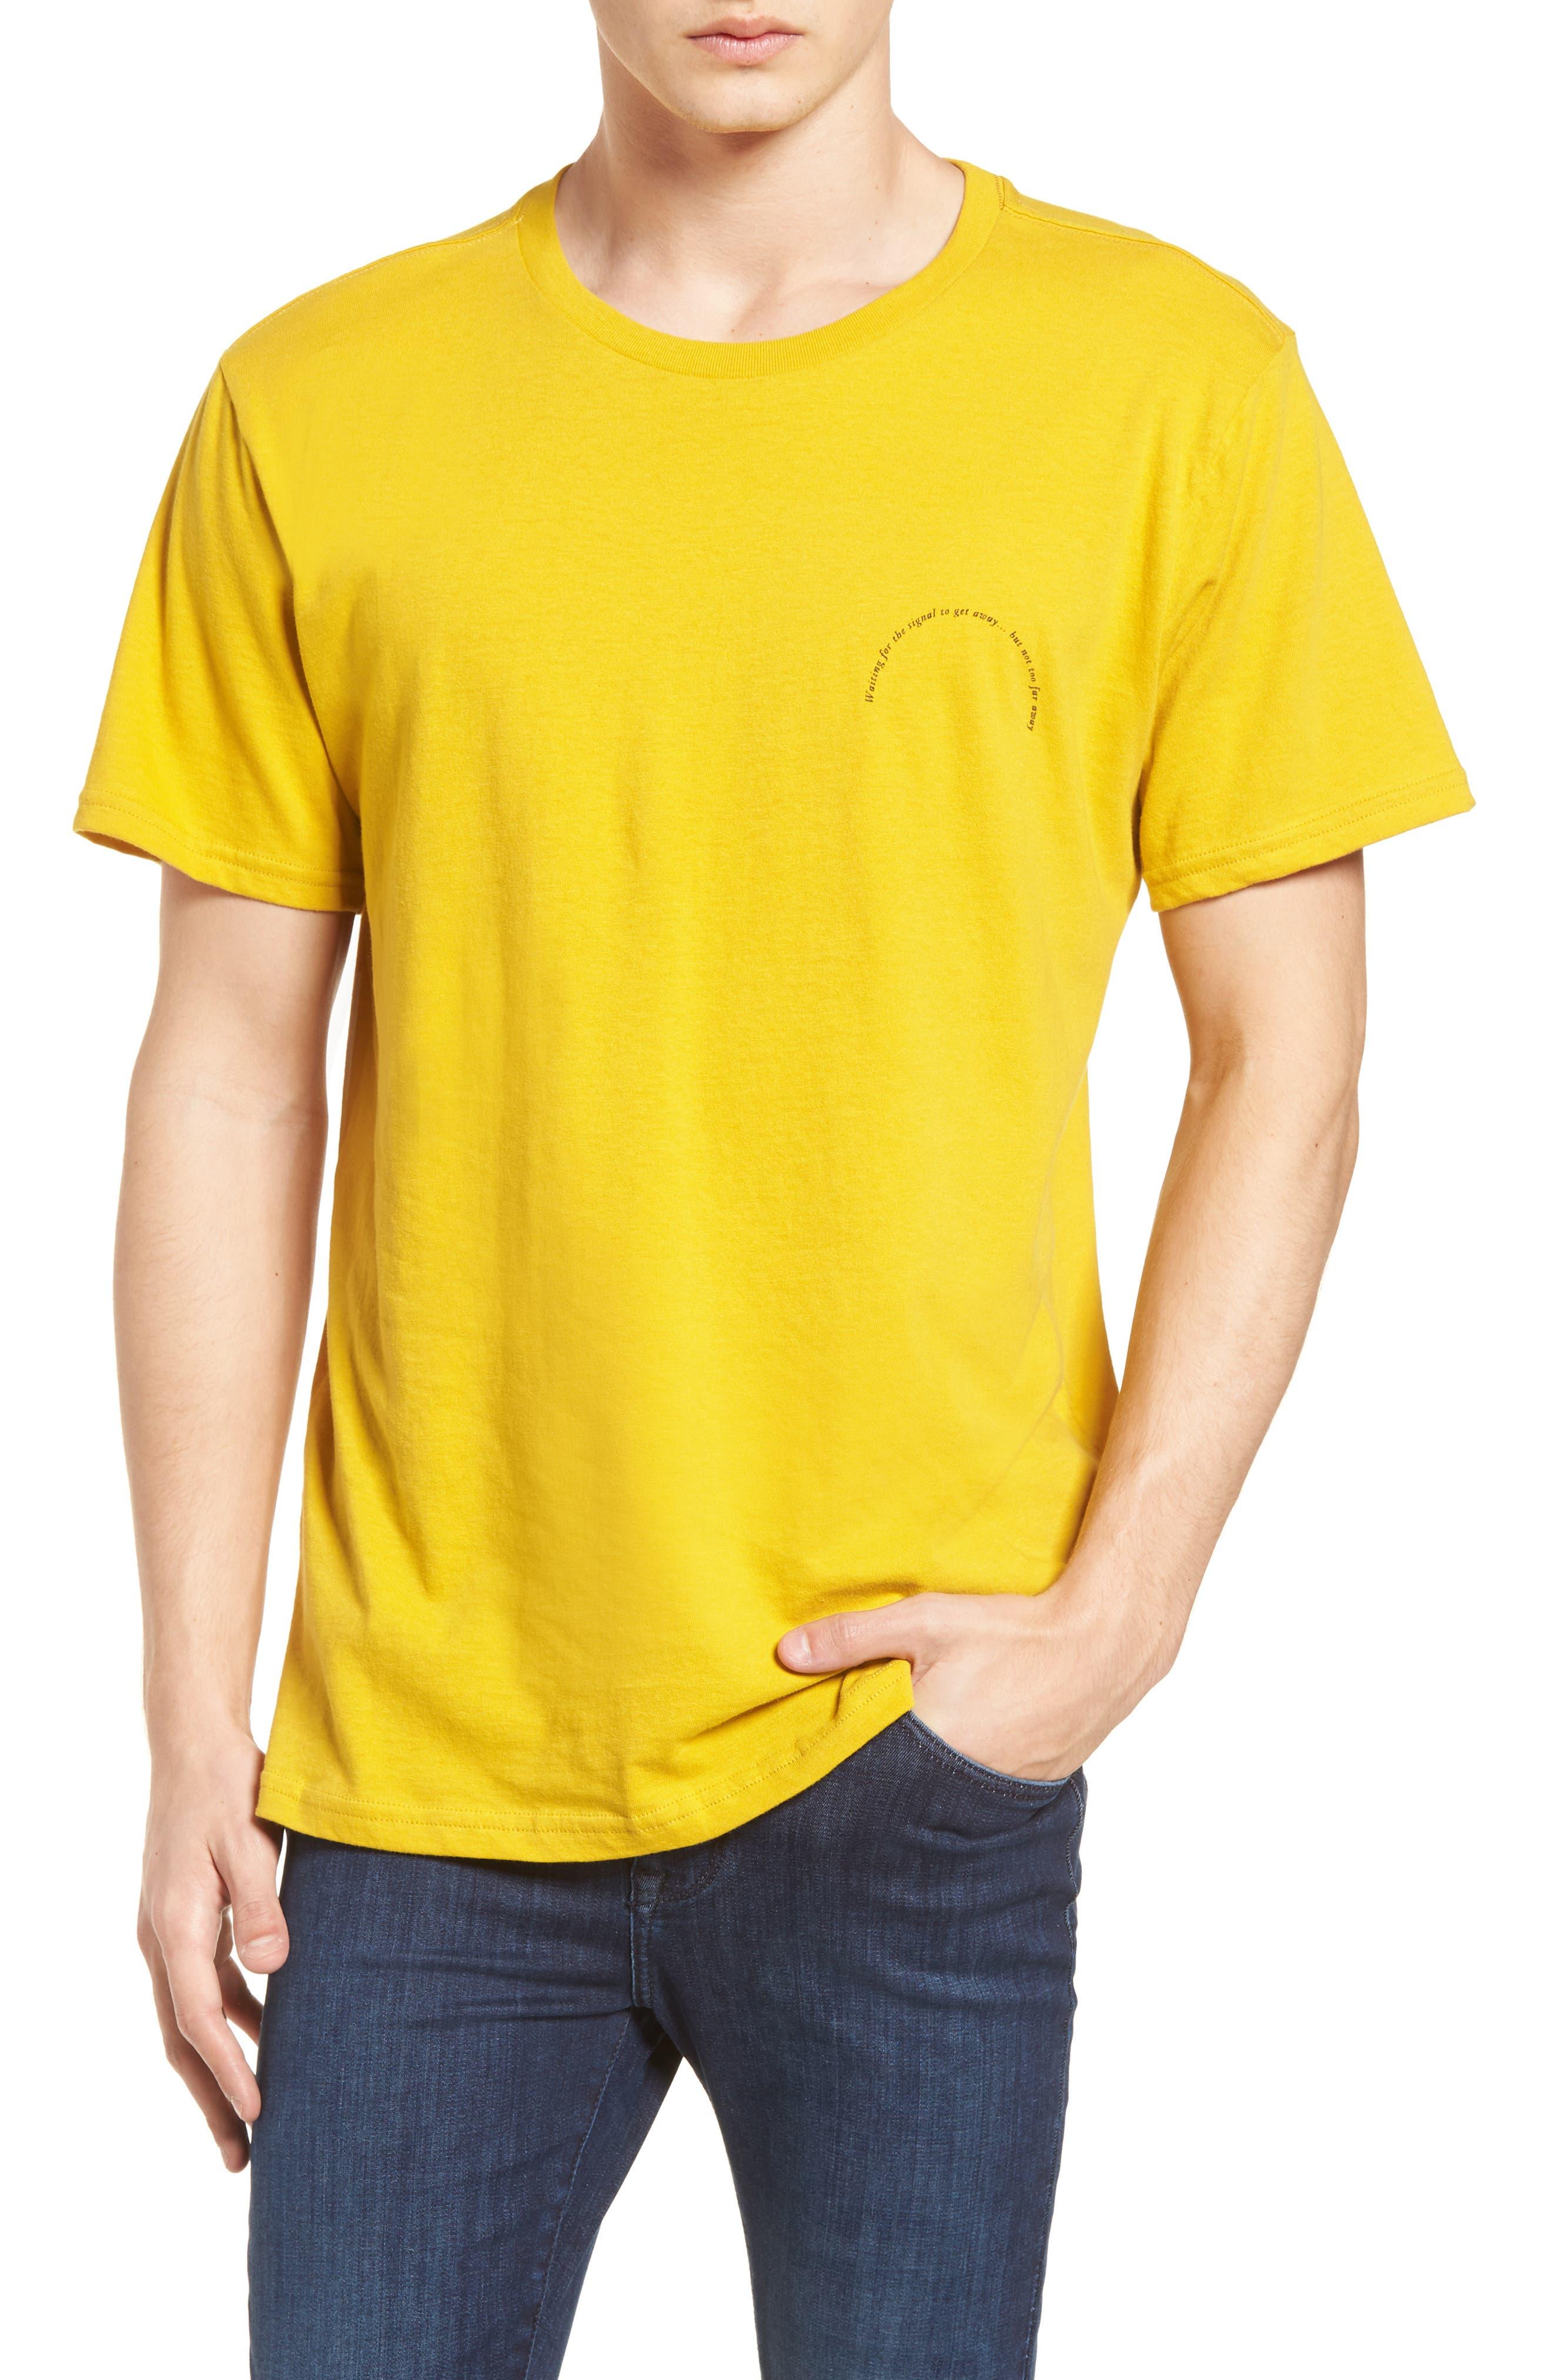 Twin Palms Graphic T-Shirt,                             Main thumbnail 1, color,                             Mustard Yellow